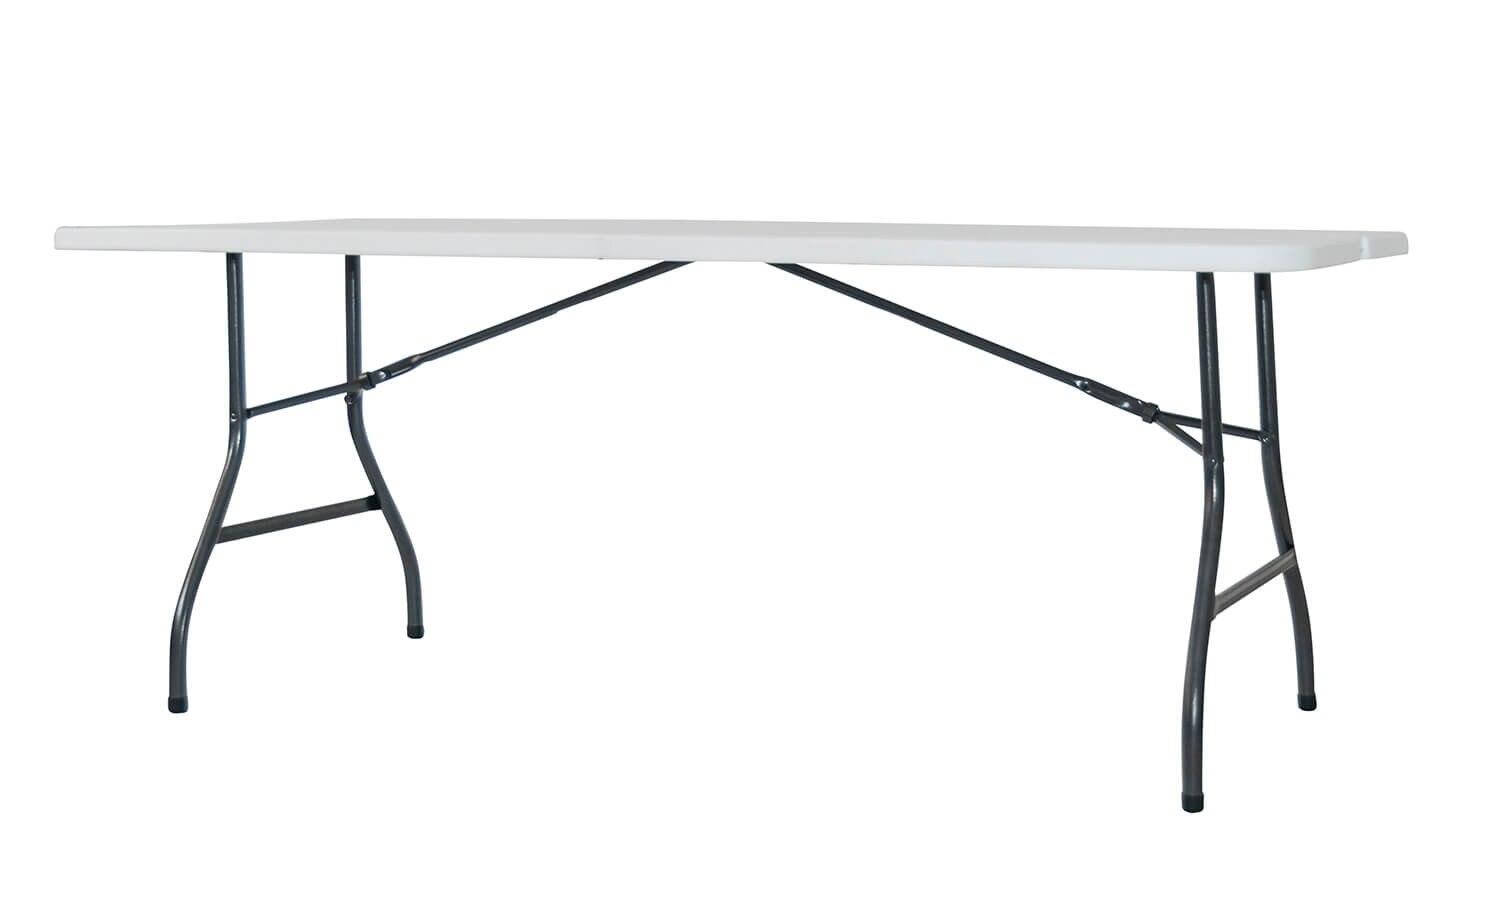 Newstorm Steel Table Folding Type Suitcase Oskar180-50011001146737